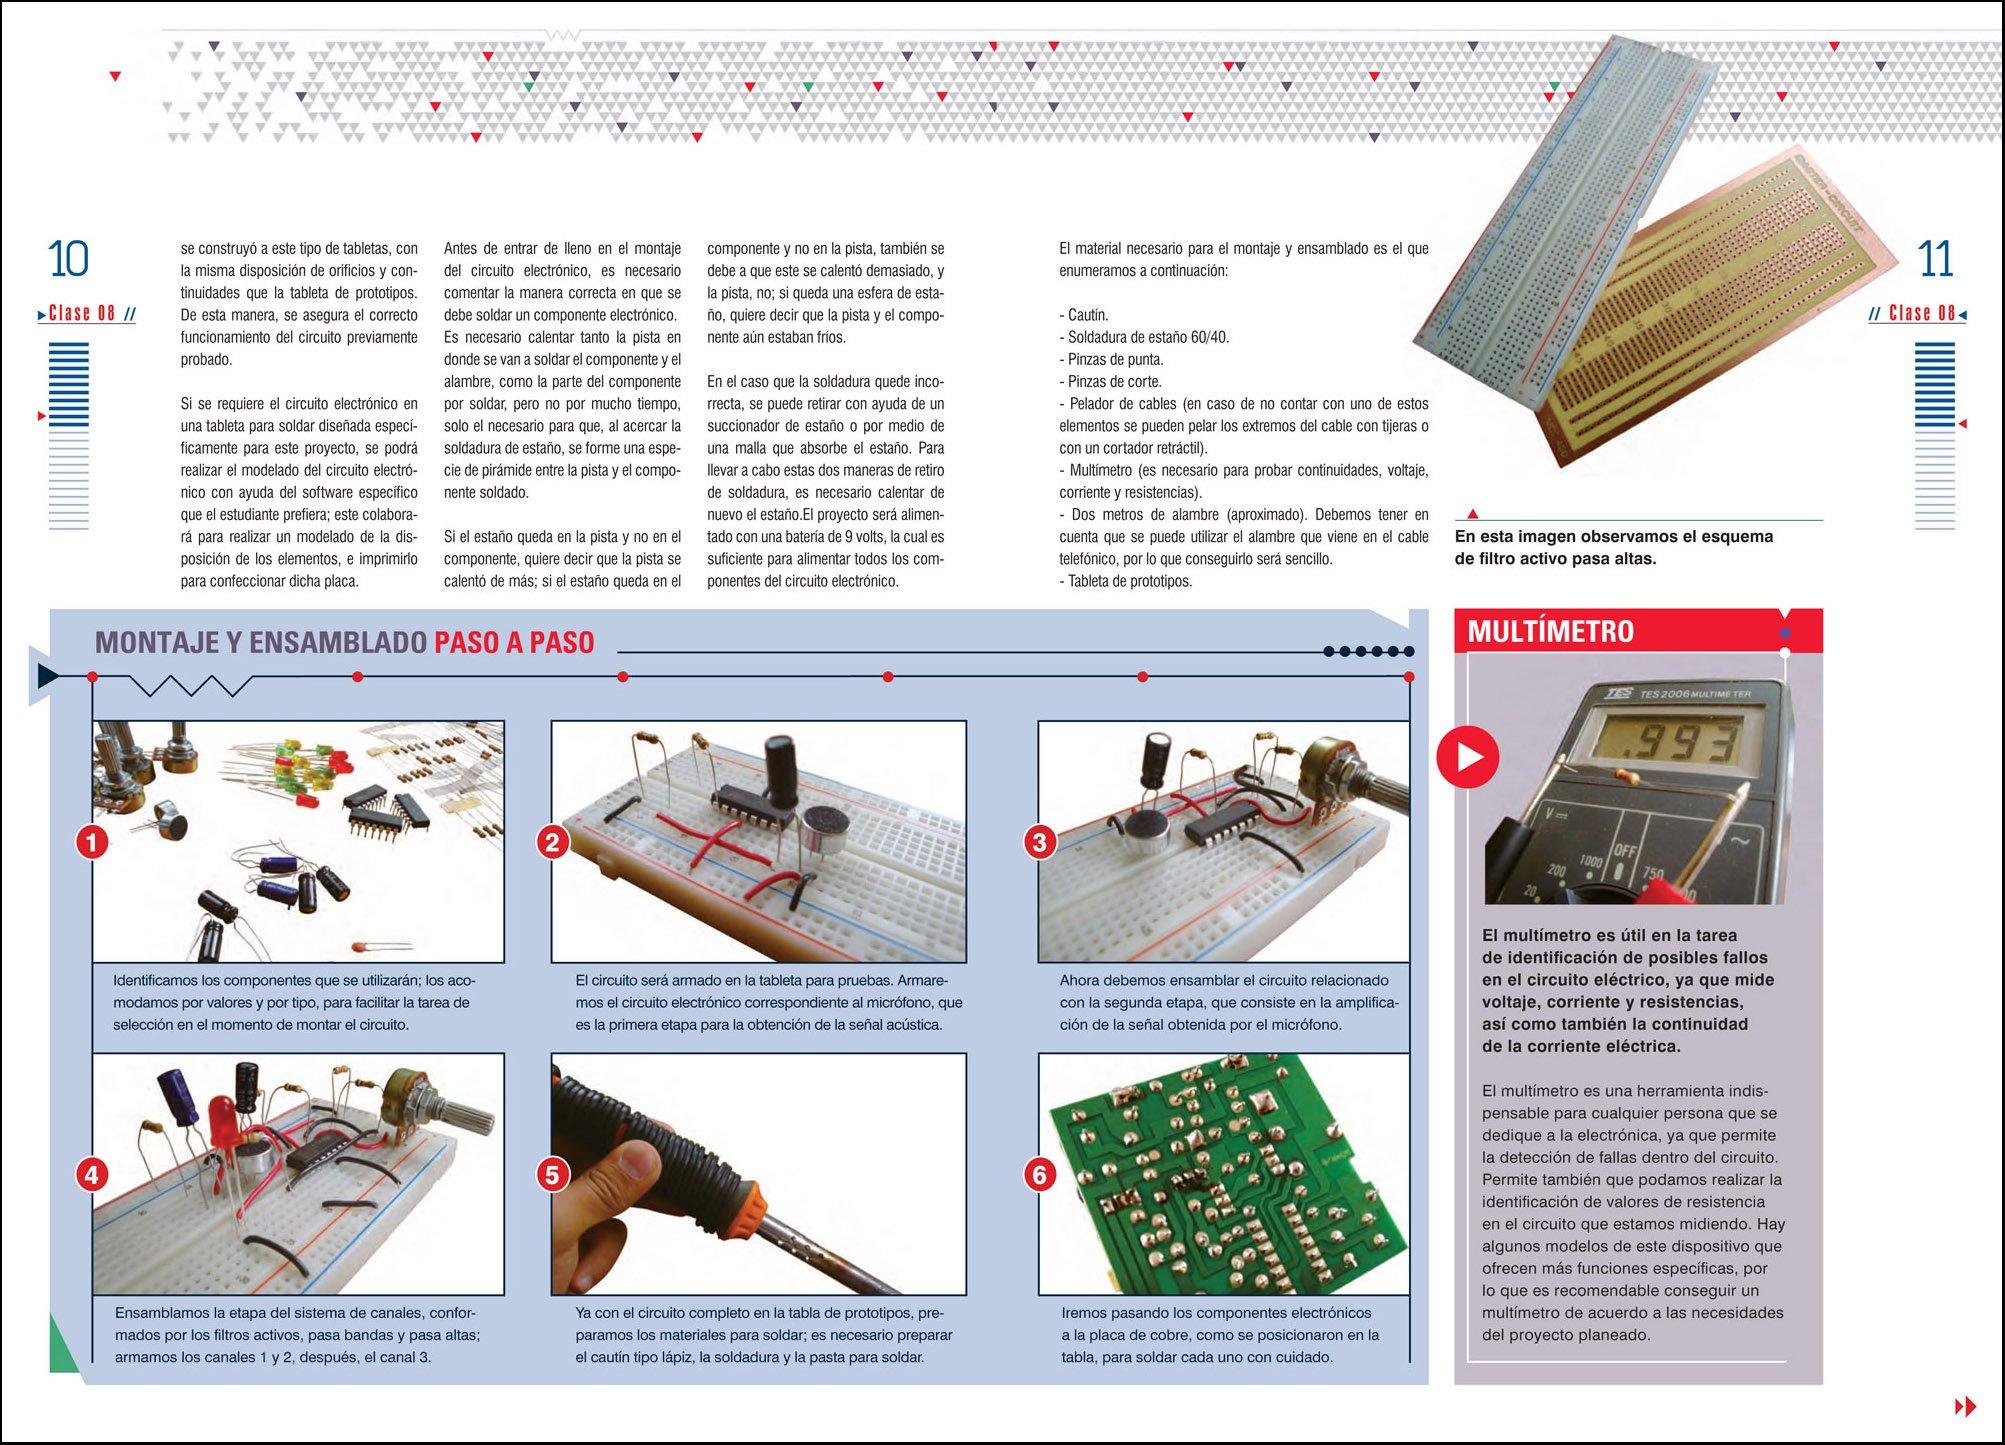 Electrónica (Spanish Edition): Staff USERS, USERS, Español Espanol Espaniol, Arduino Microcontroladores pic Circuitos Programación Robótica Domótica: ...